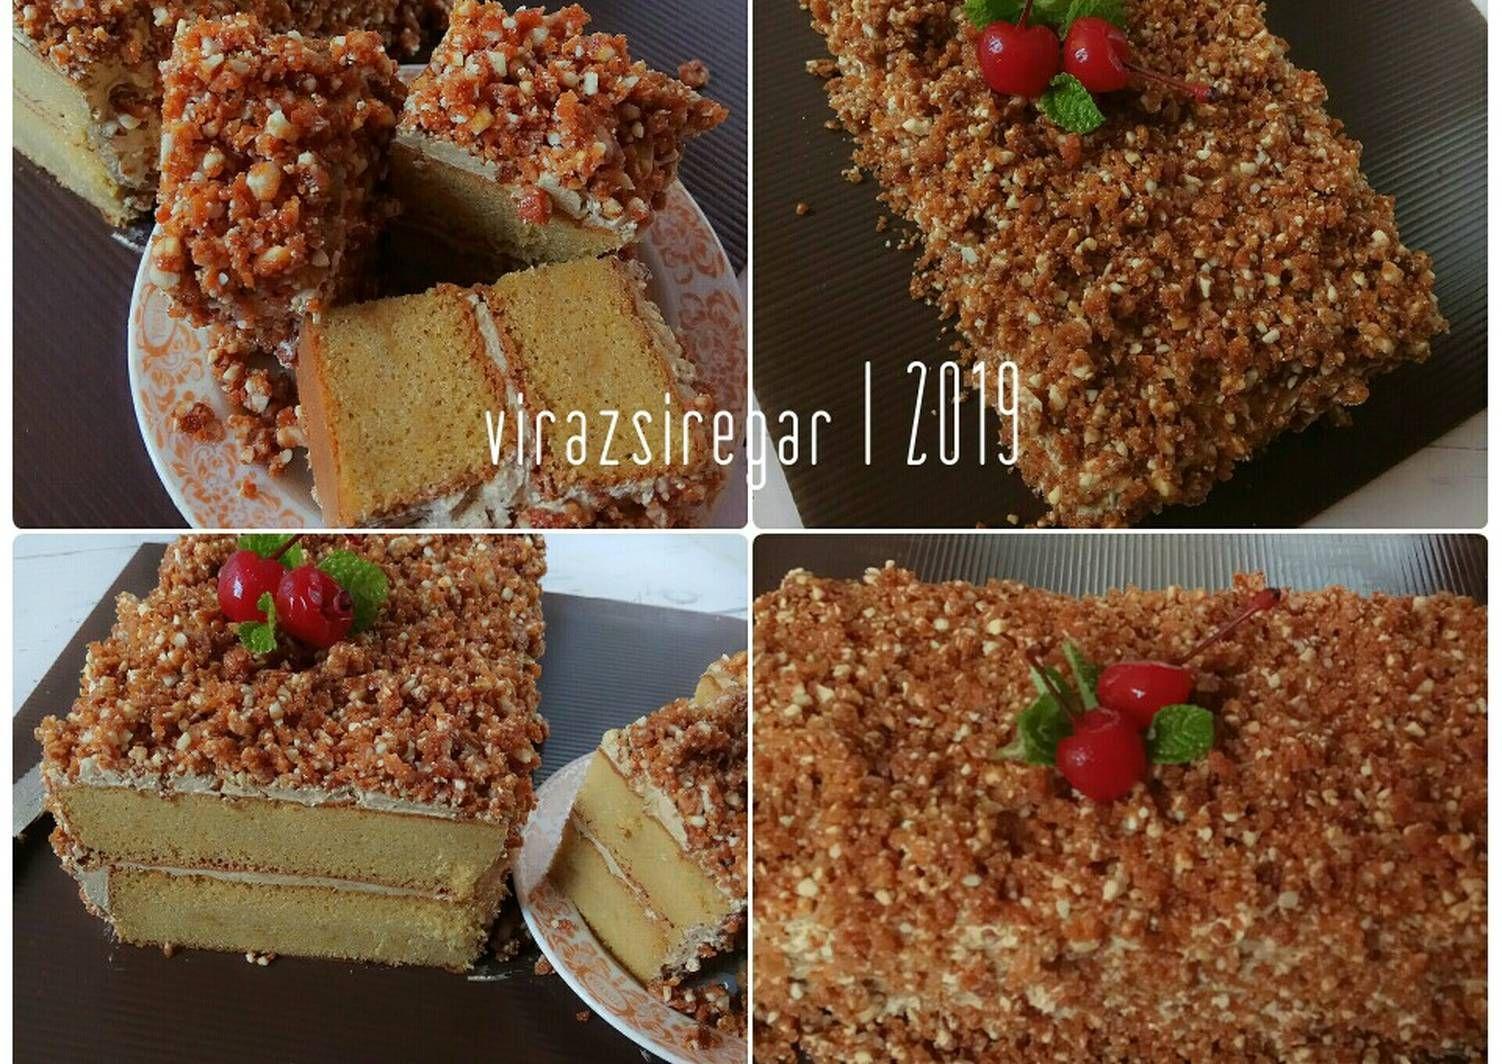 Resep Mocca Nougat Cake Oleh Virazsiregar Resep Kacang Mocha Resep